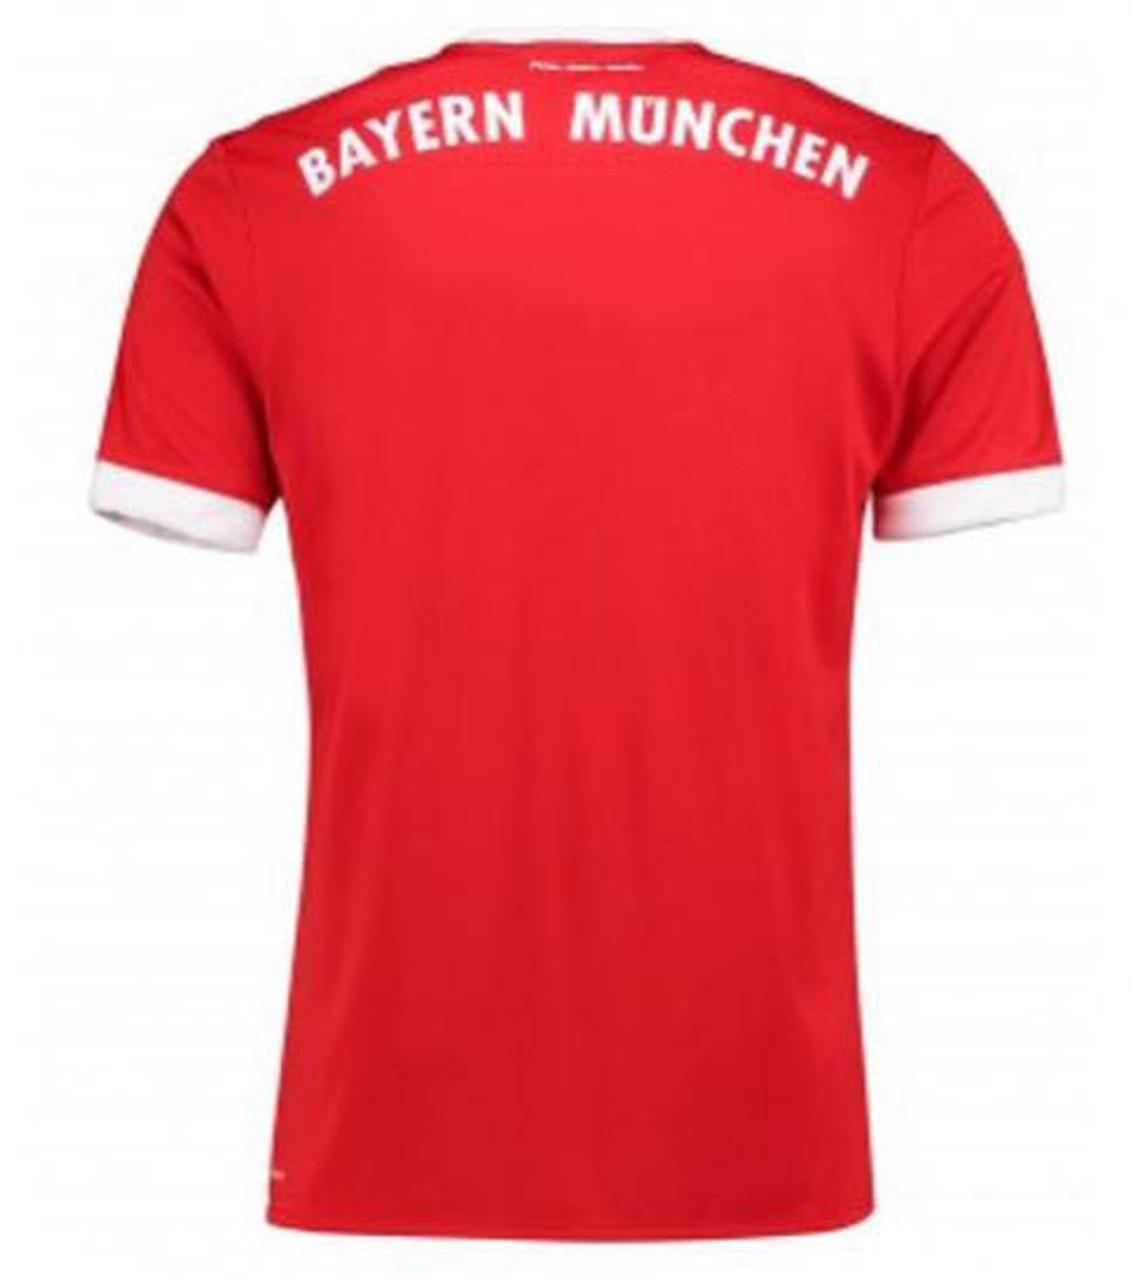 6a828870b ... Adidas Bayern Munich 2017-2018 Home Jersey - True Red White (050519).  Add to Cart